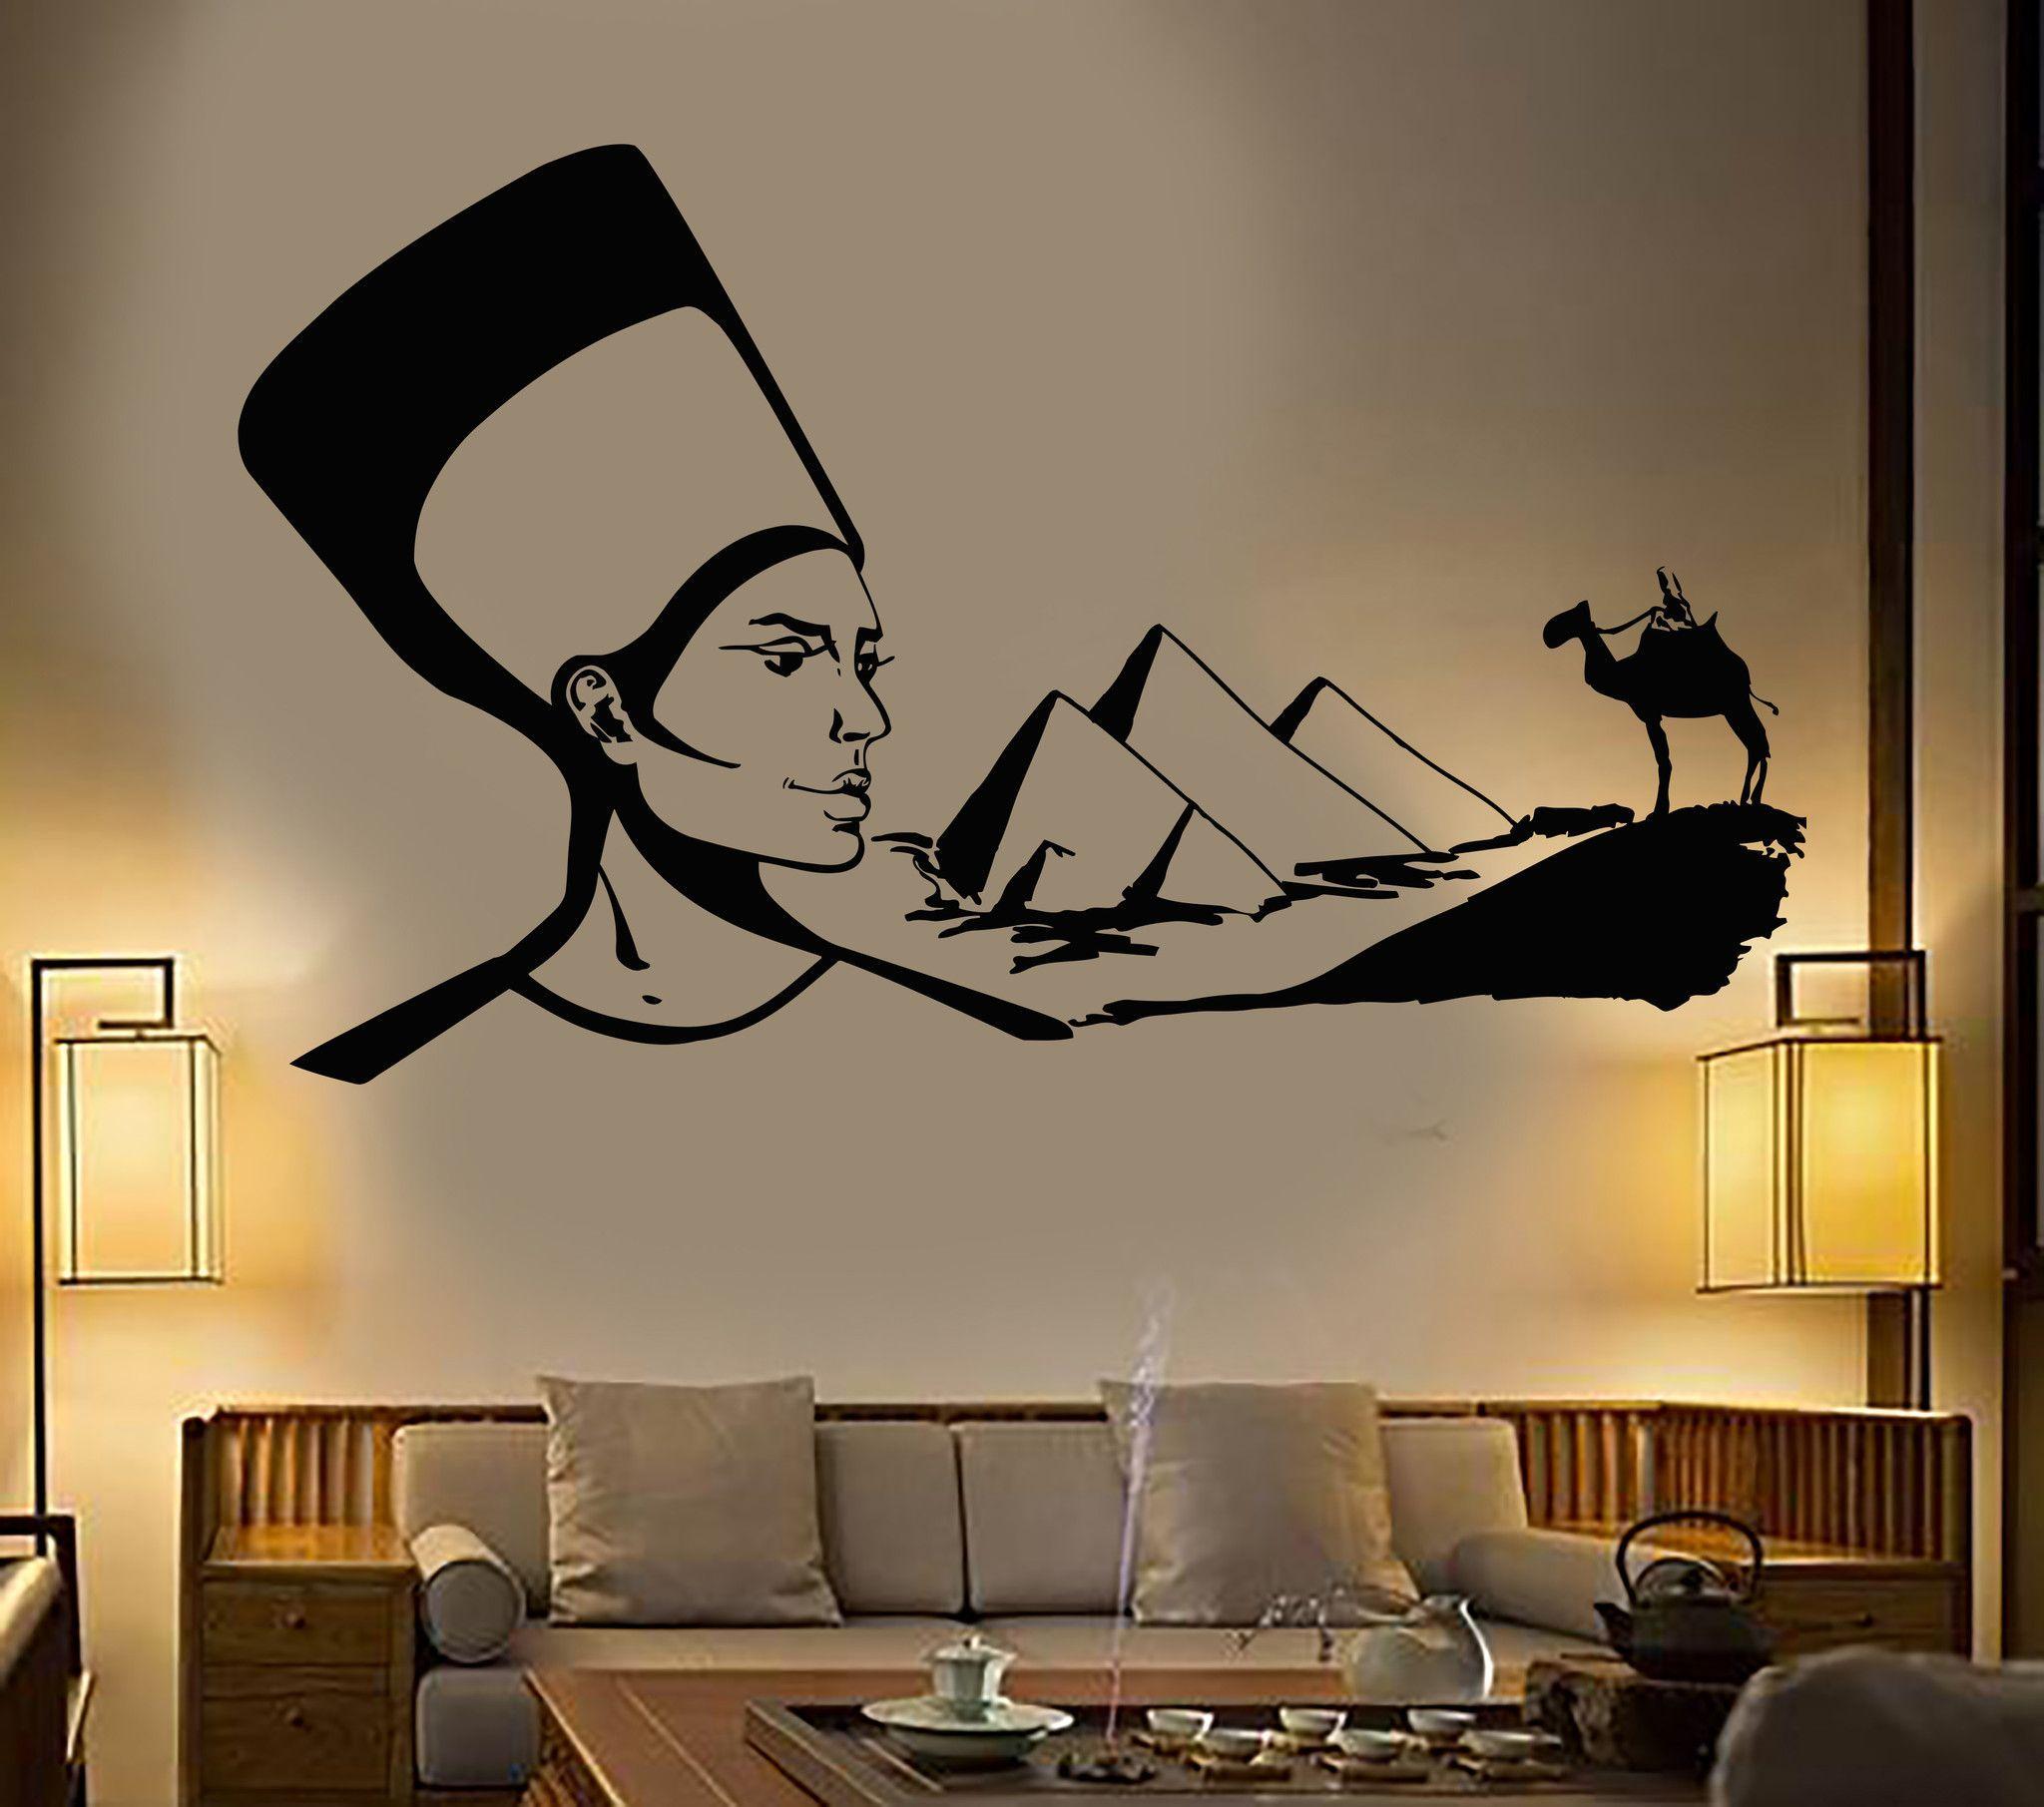 Vinyl Wall Decal Egypt Bedouin Desert Camel Cleopatra